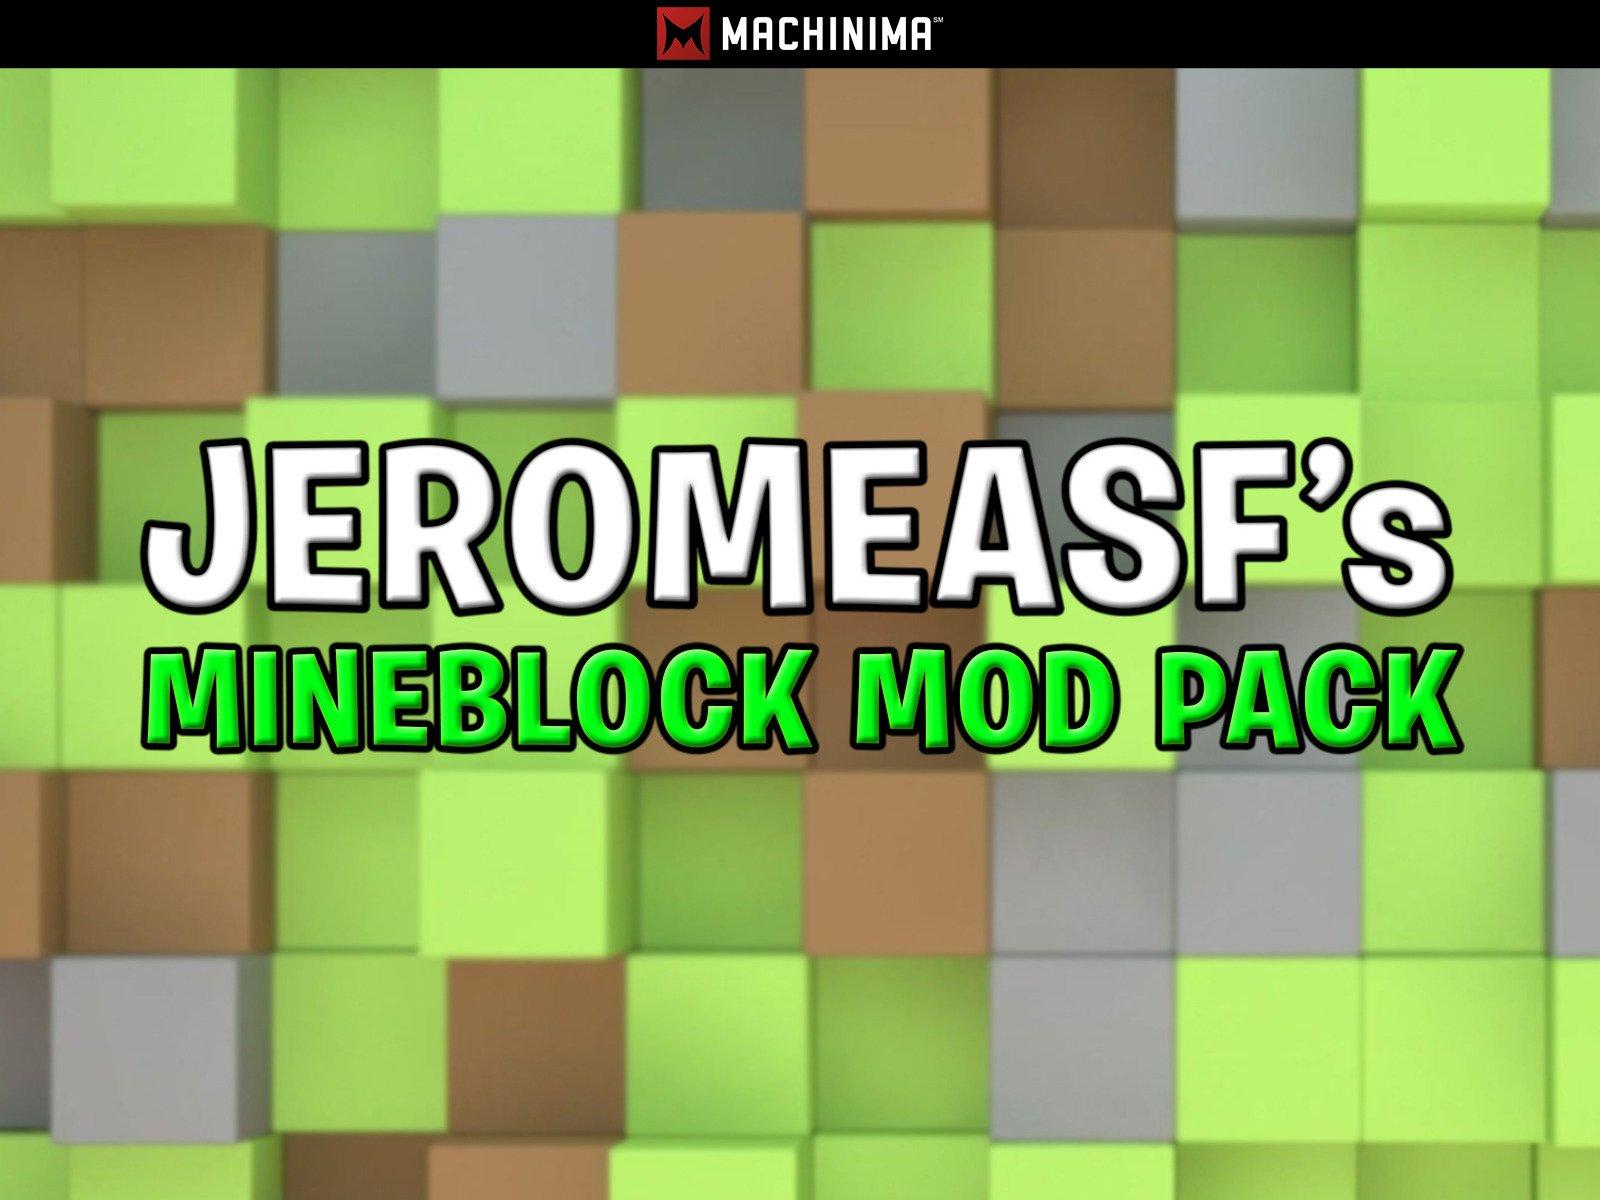 JeromeASF's Mineblock Mod Pack - Season 5